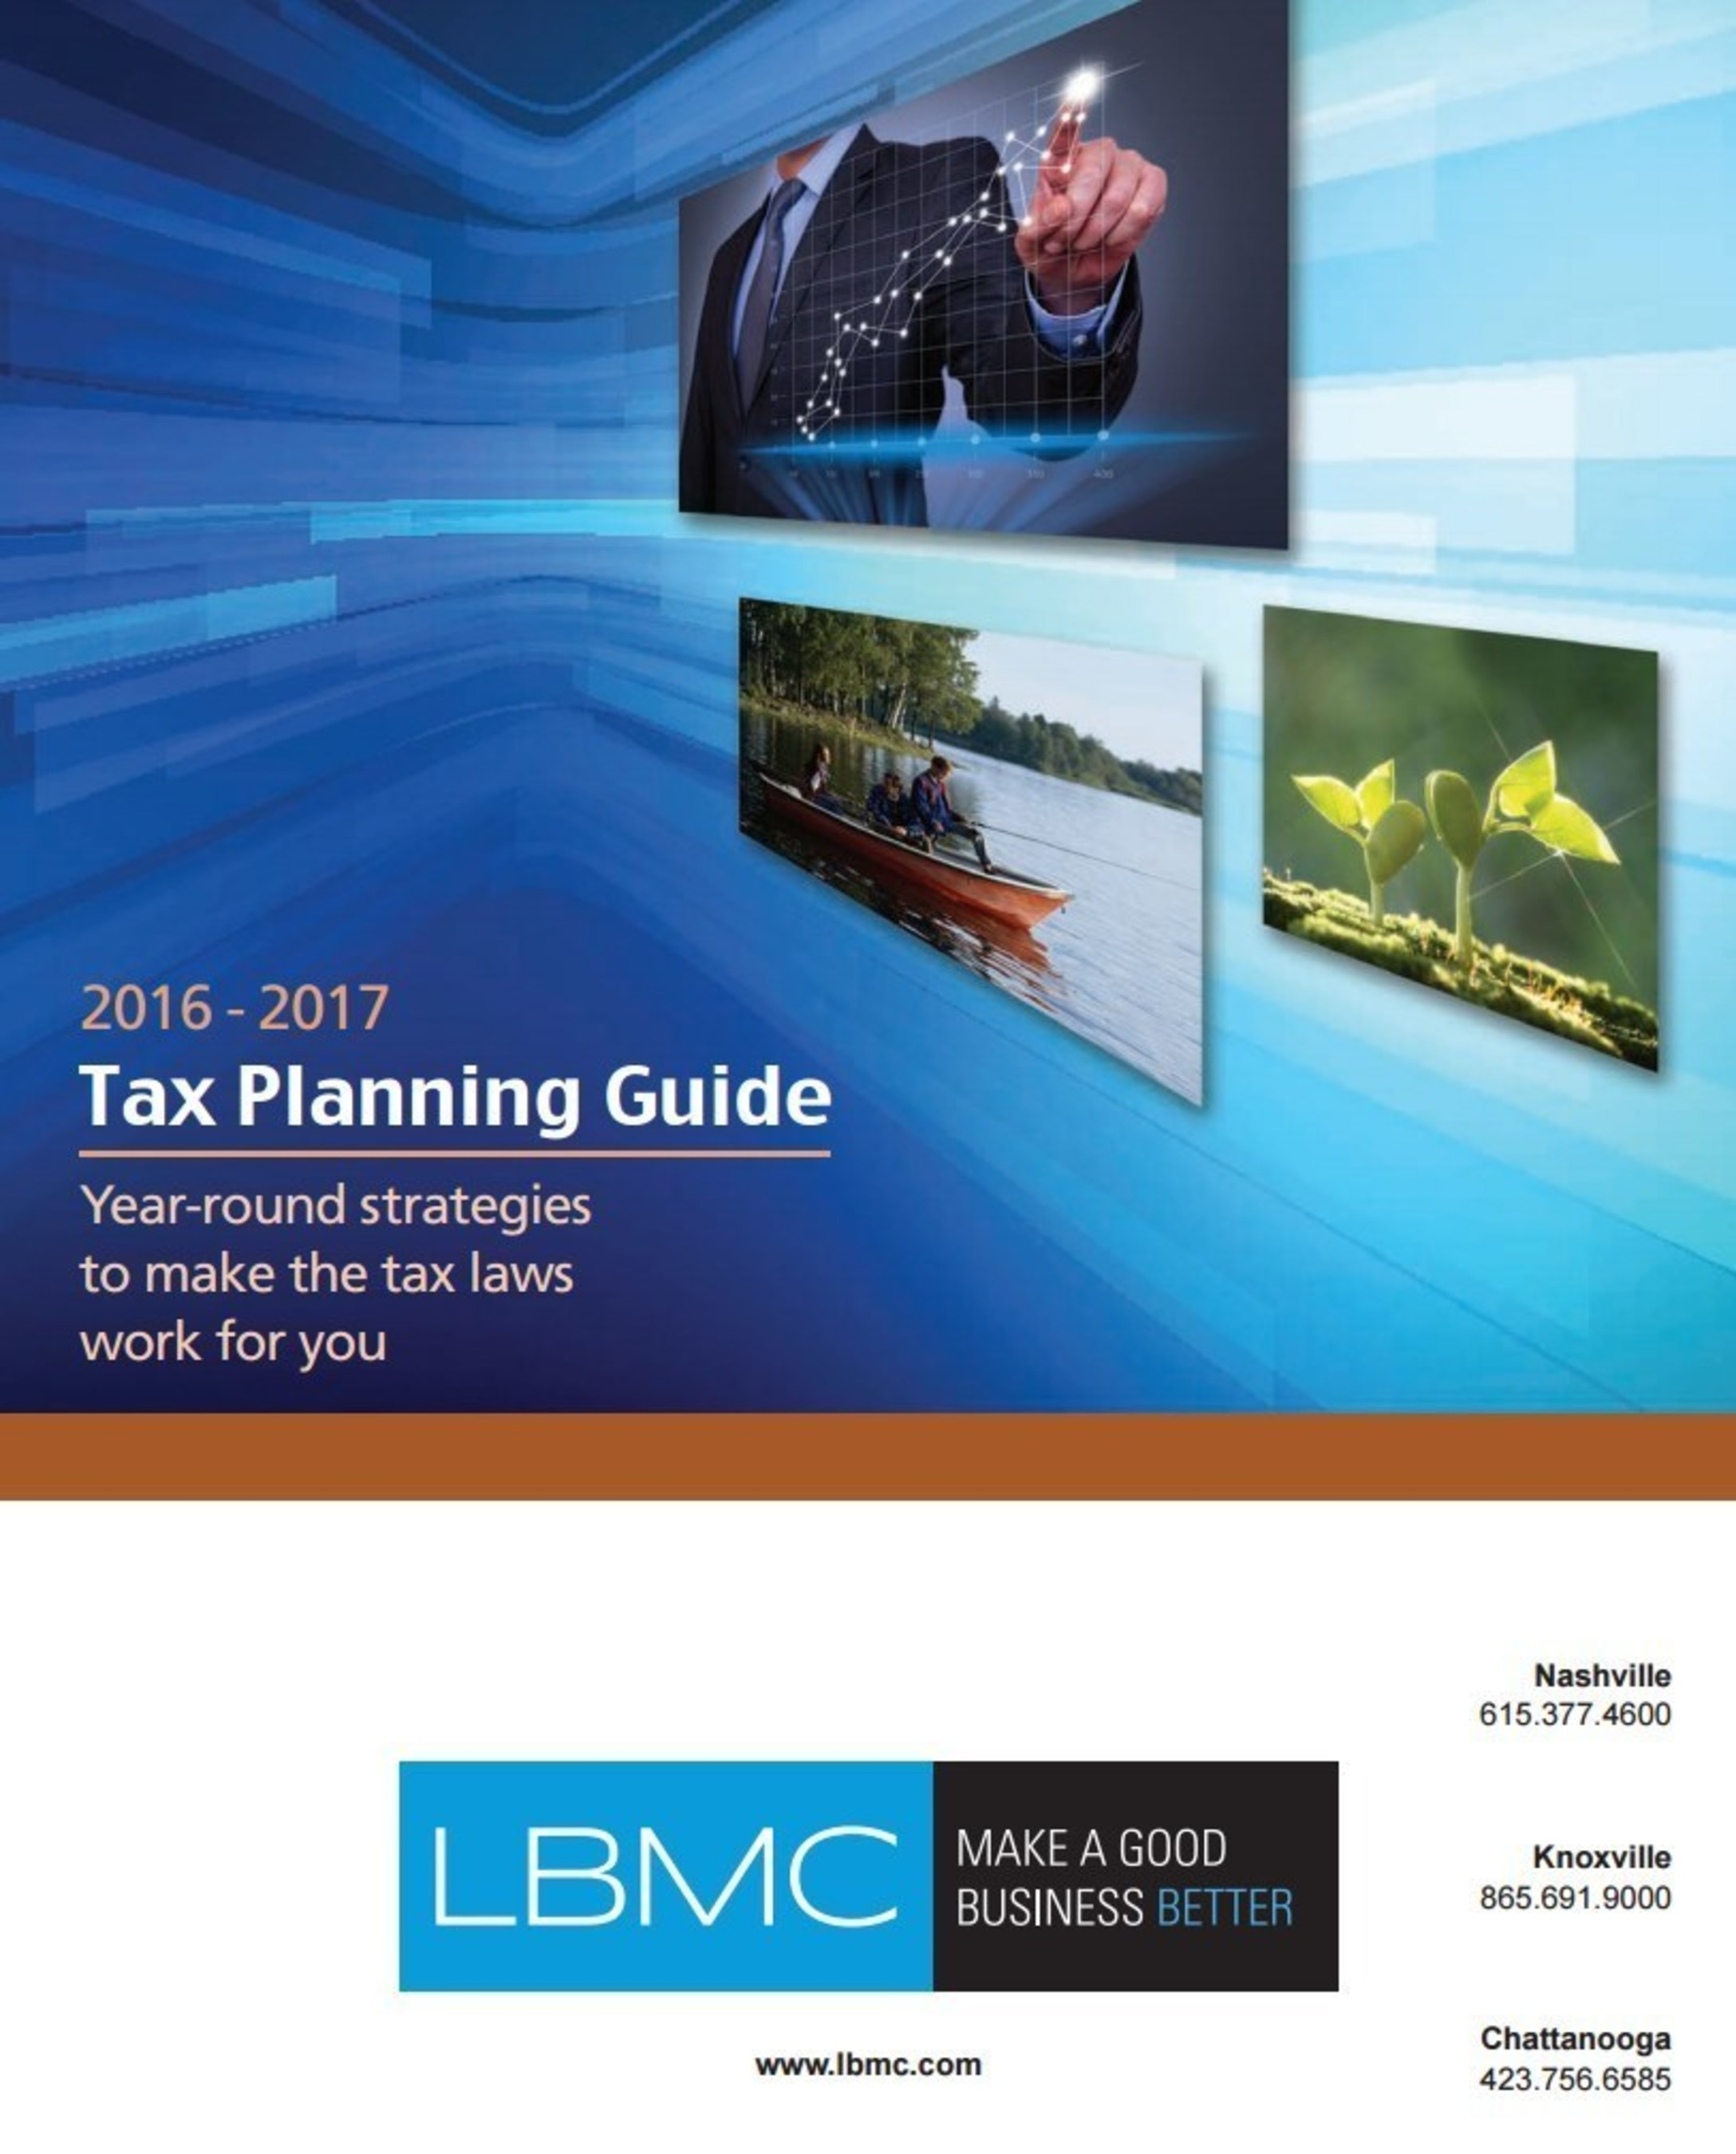 LBMC 2016-2017 Tax Planning Guide